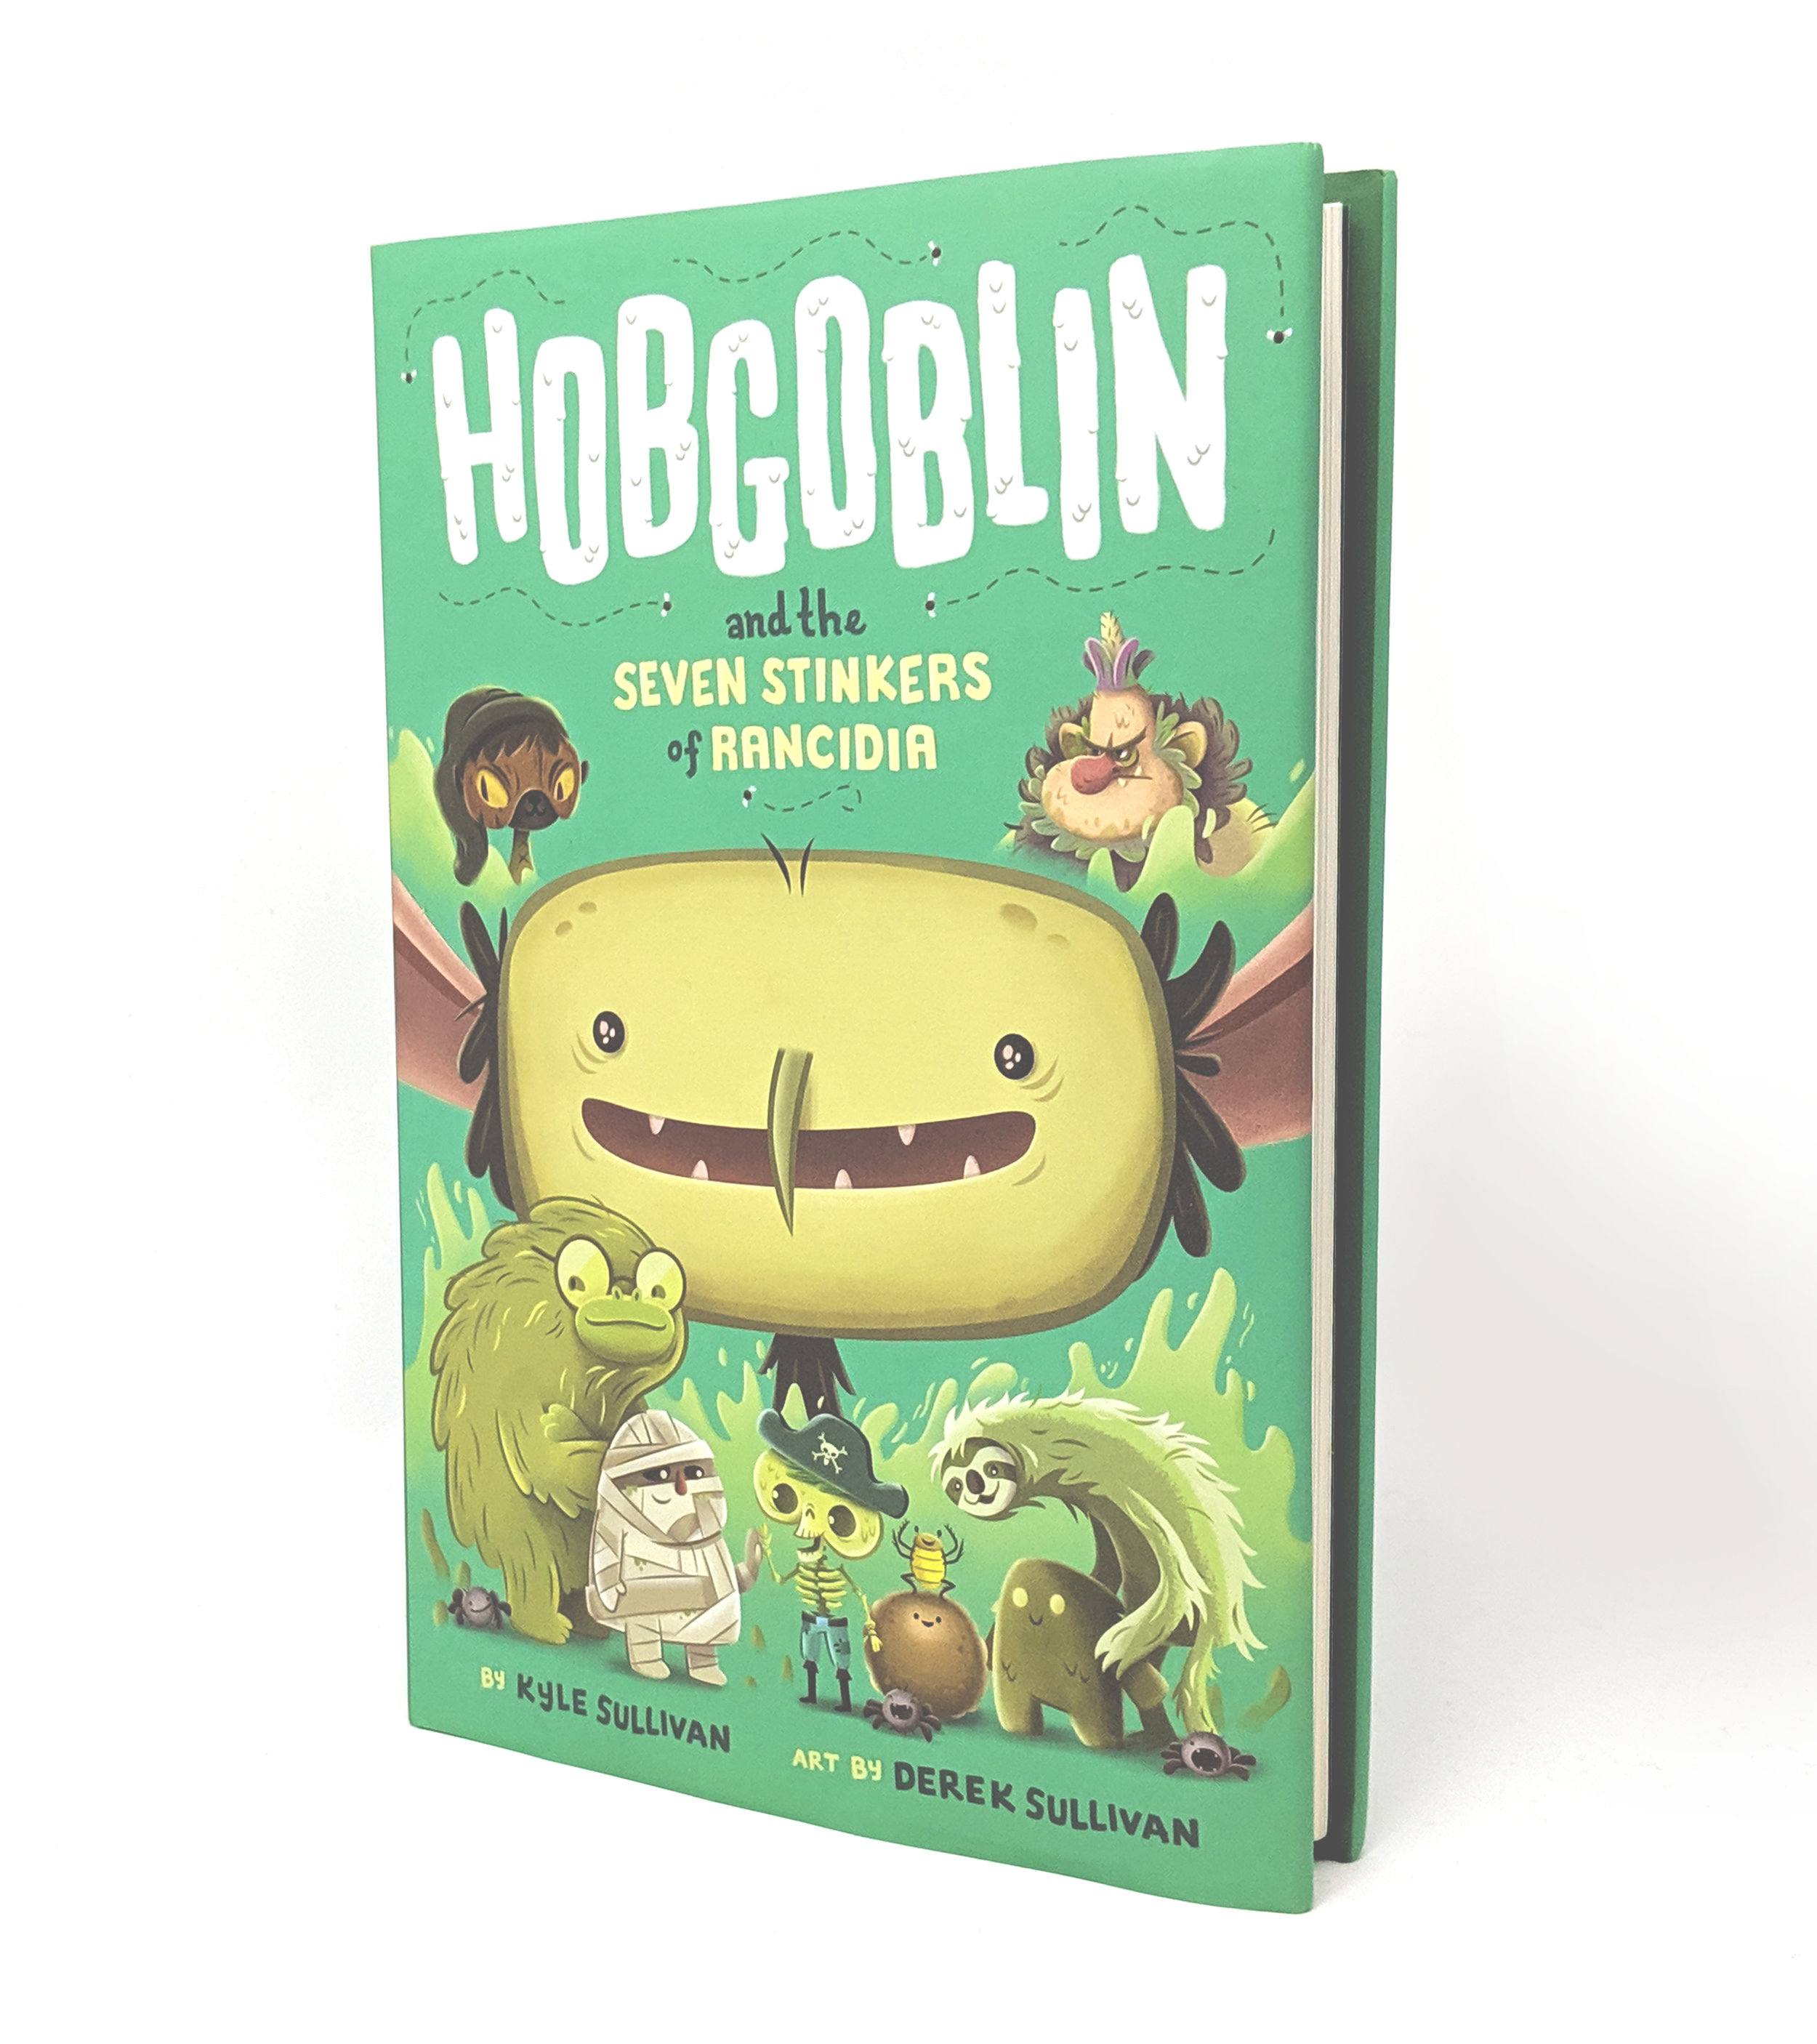 Cover art:  Hobgoblin and the Seven Stinkers of Rancidia.  Hazy Dell Press, 2019.